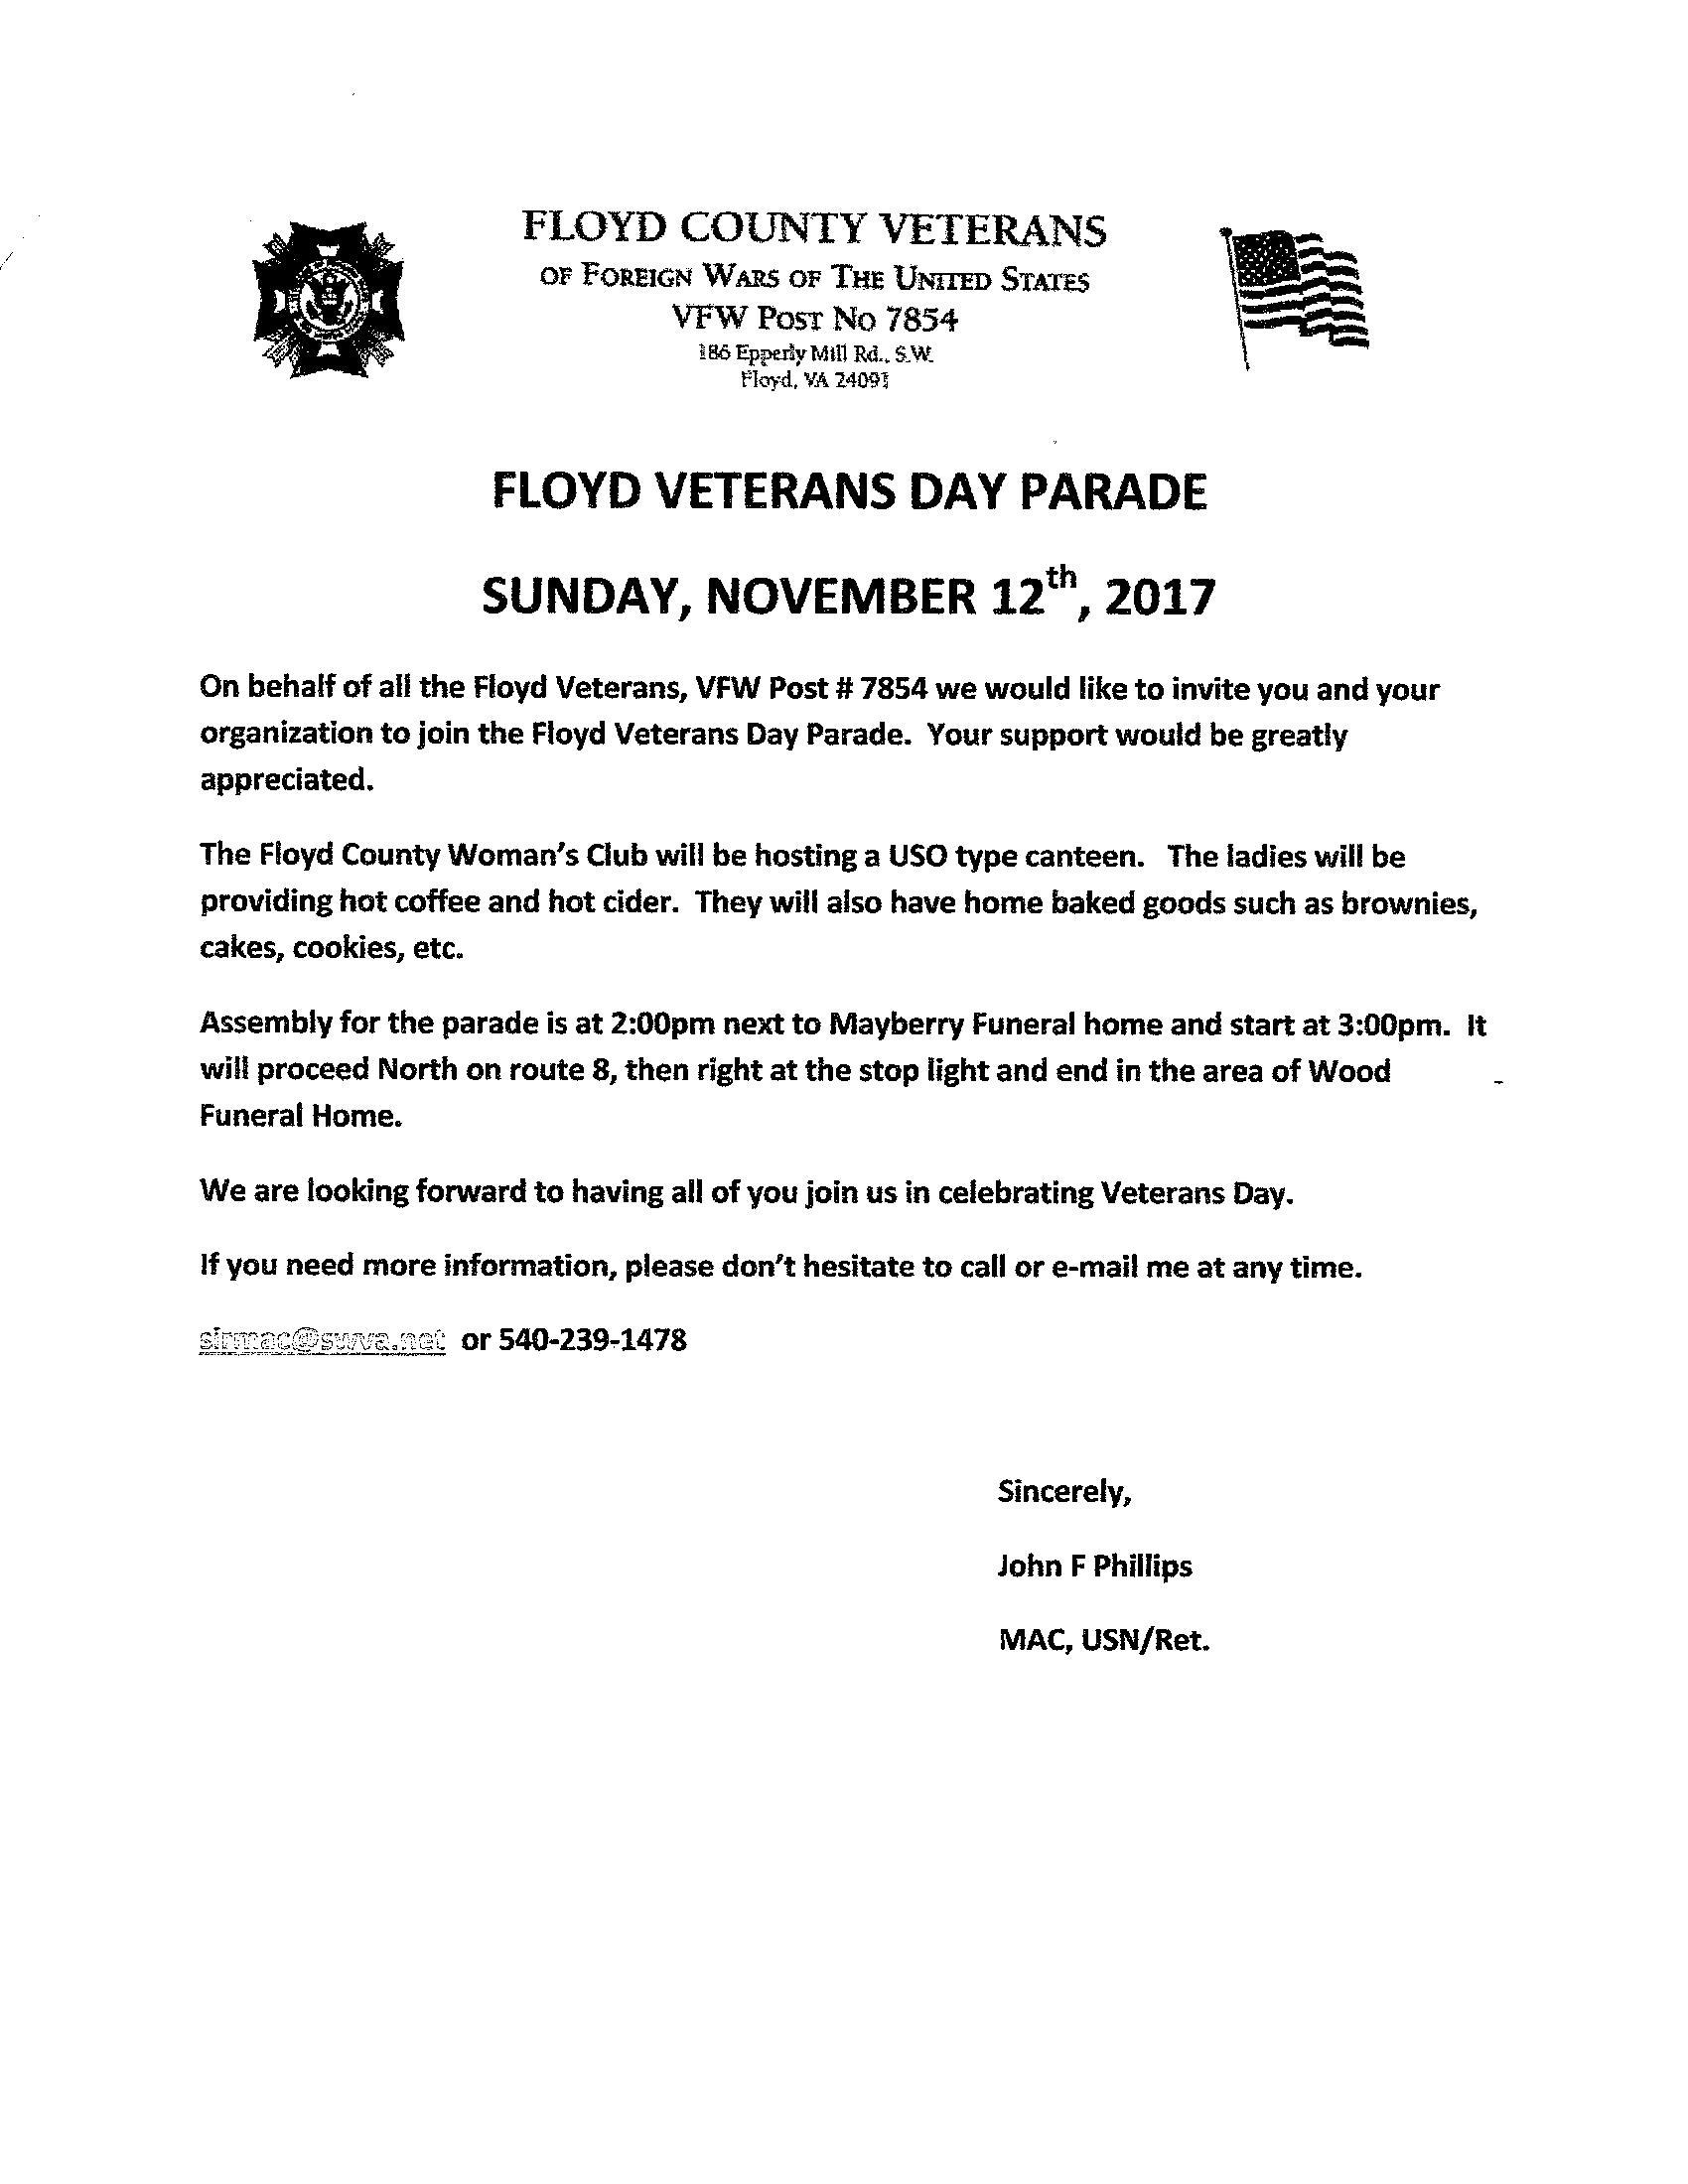 Visit Floyd Virginia | Floyd Veterans Day Parade